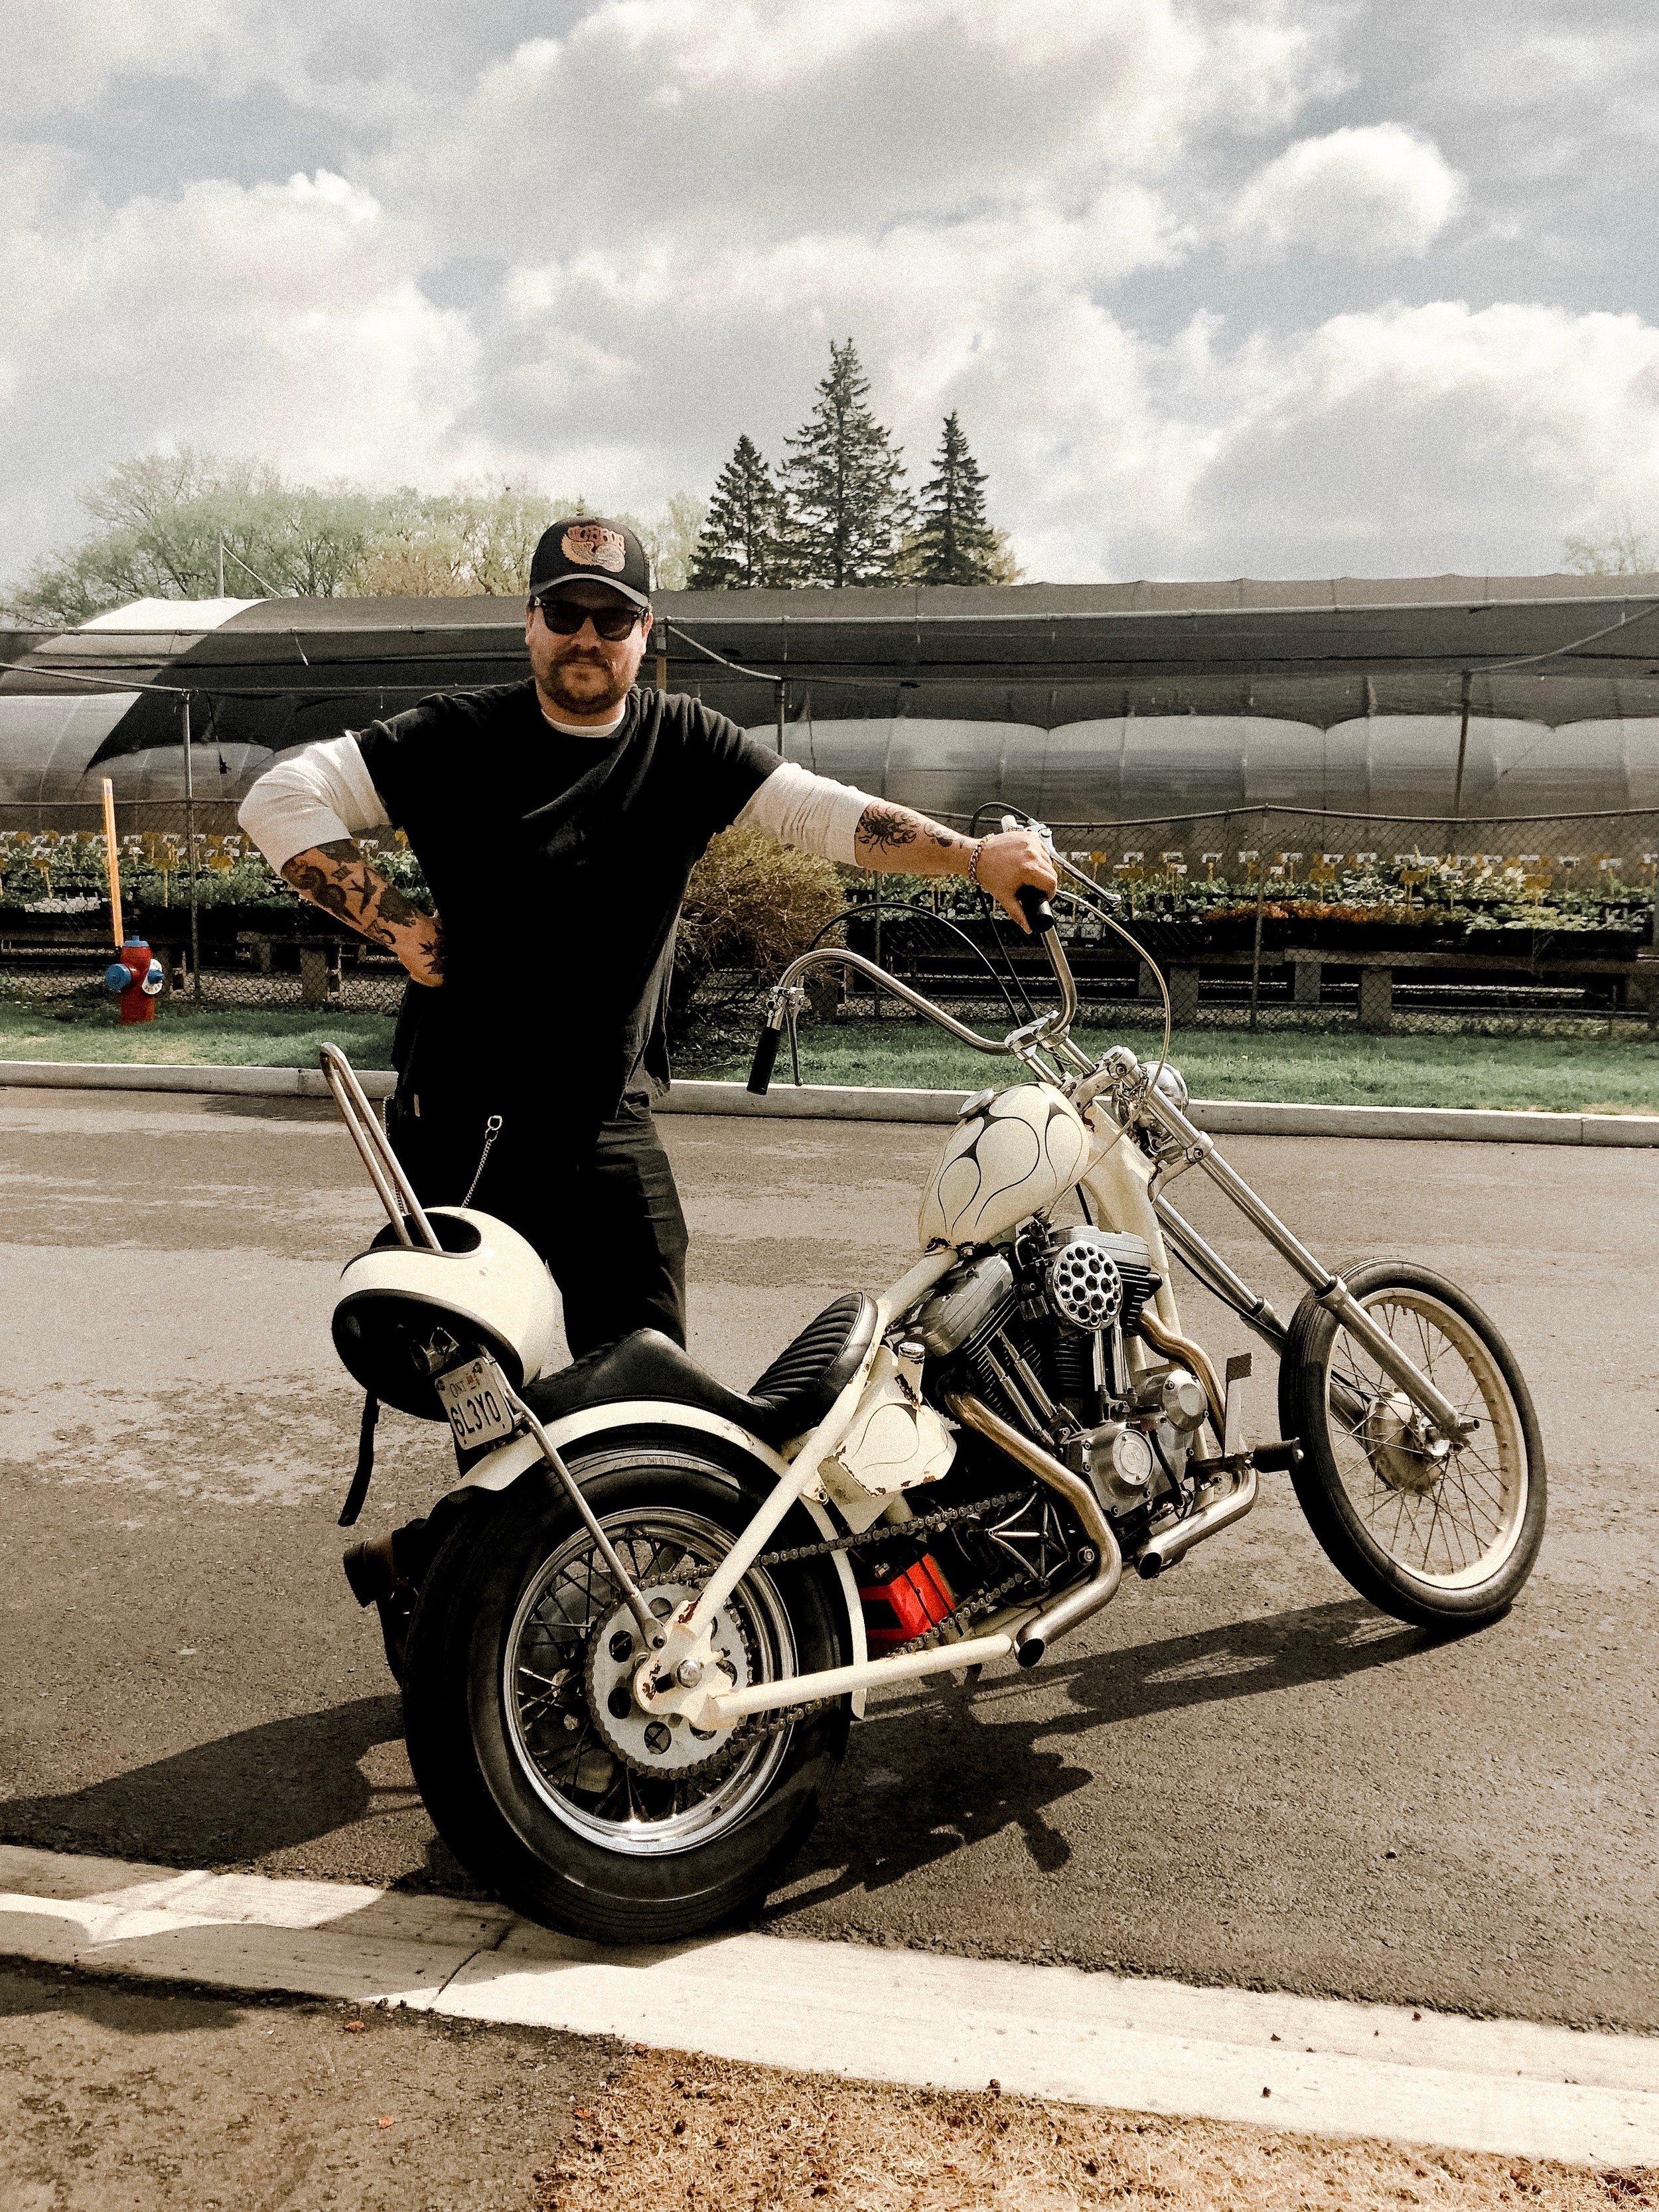 Alex's Ride | TheMotoSocialOTTAWA